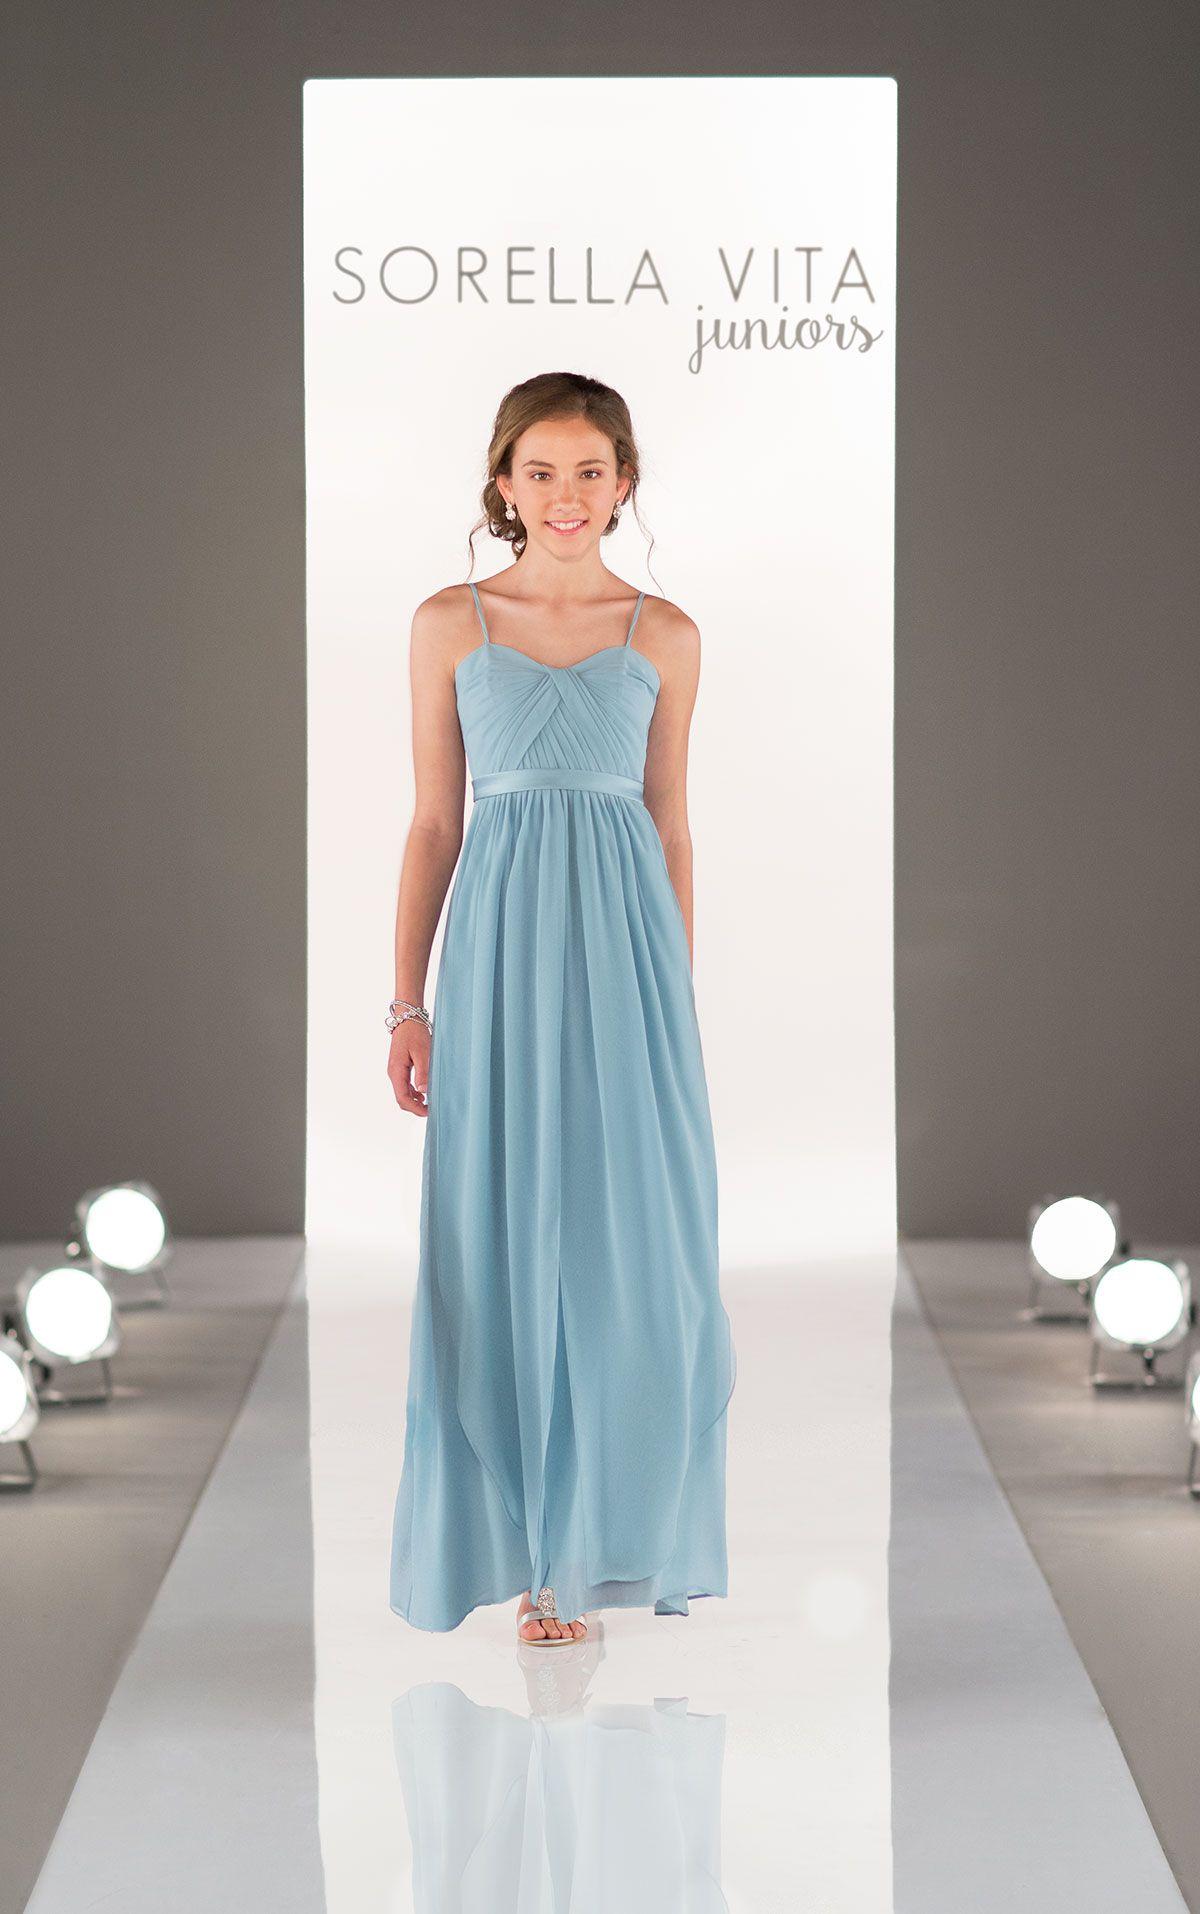 Juniors Chiffon Dress   Celebrations, Wedding and Weddings